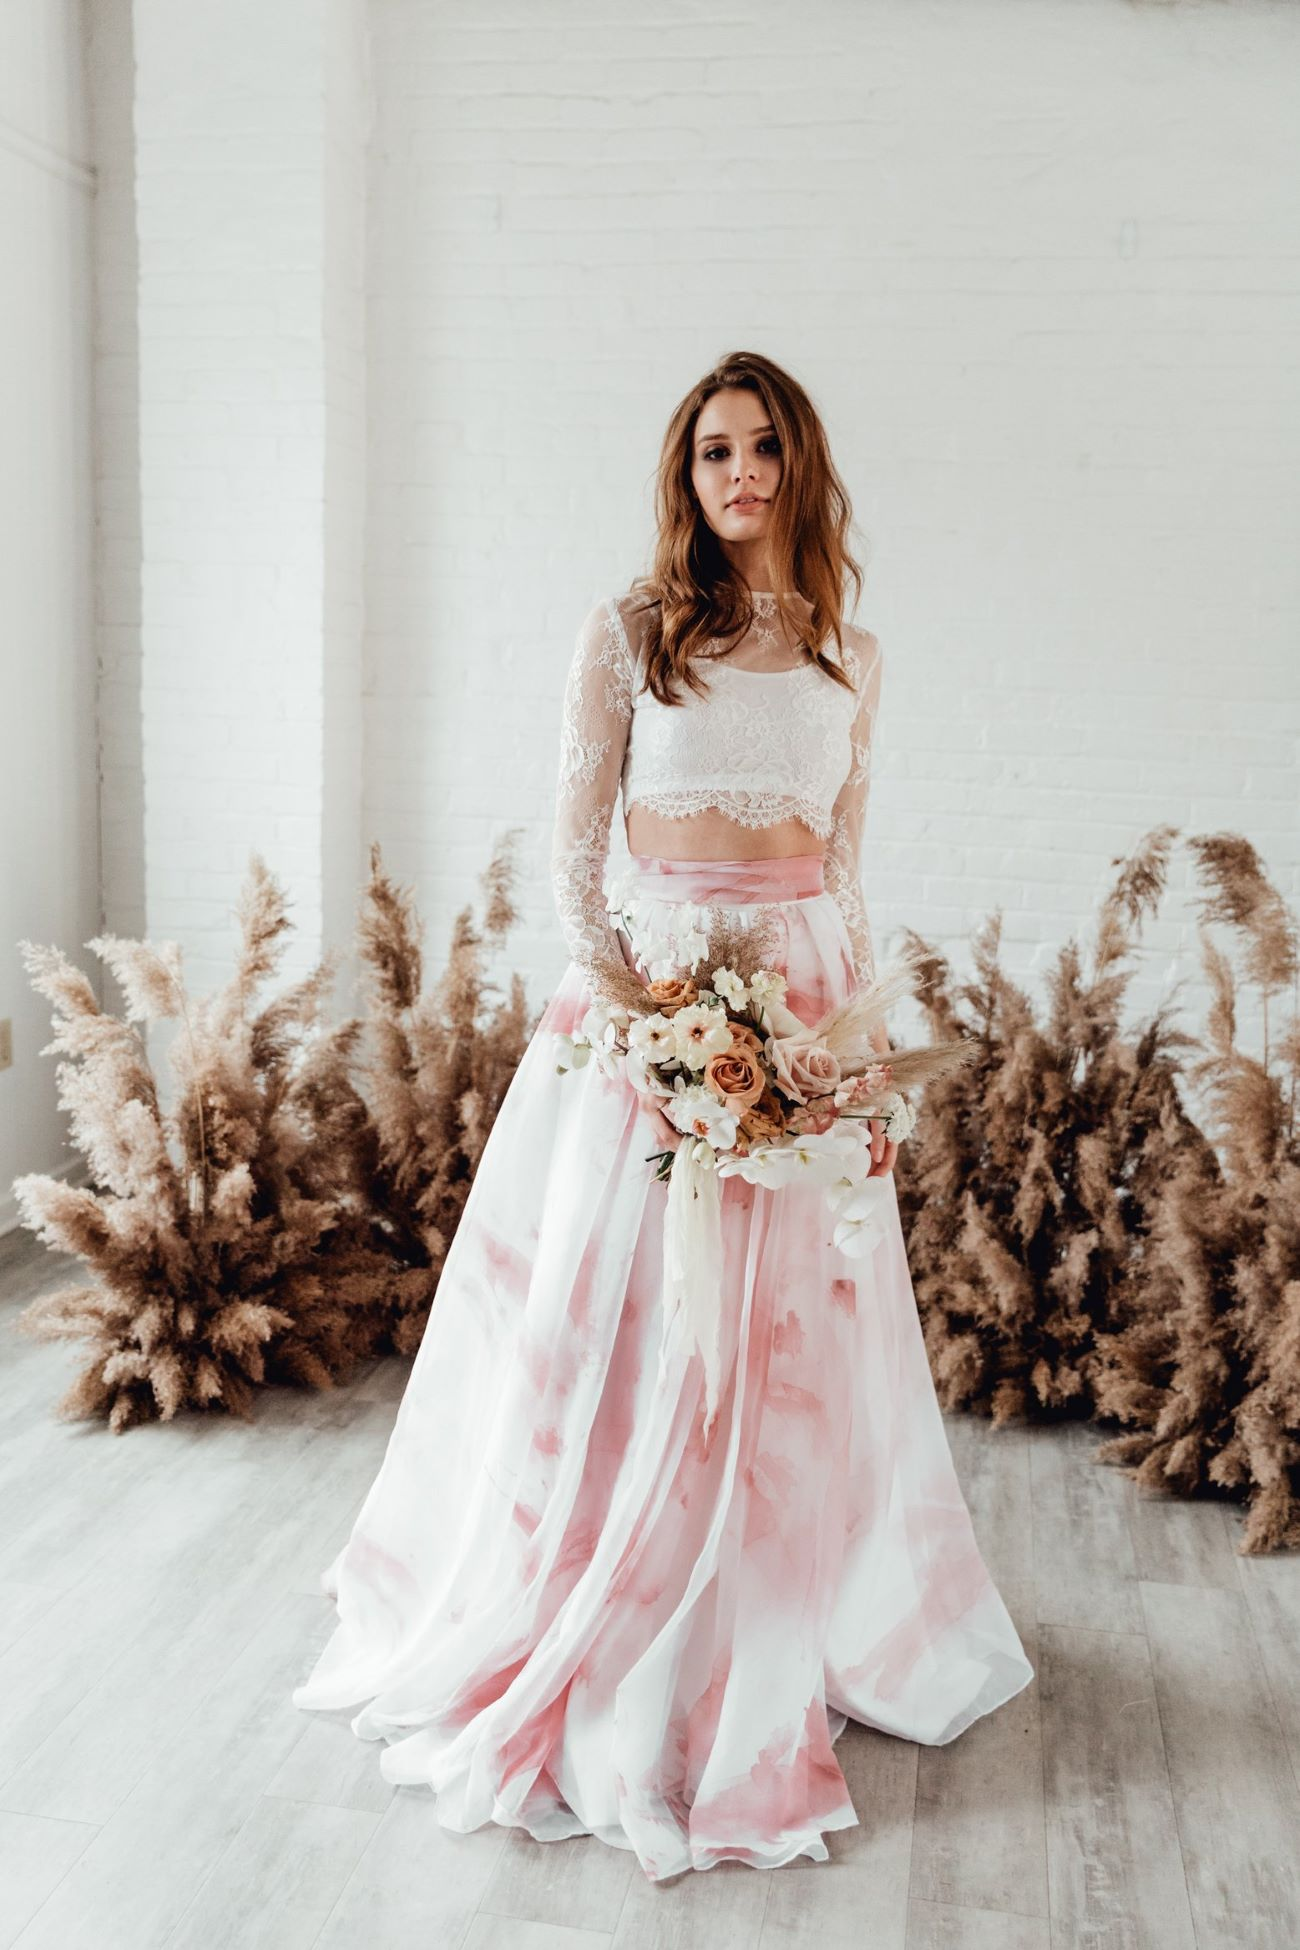 Marbled Blush Bridal Skirt